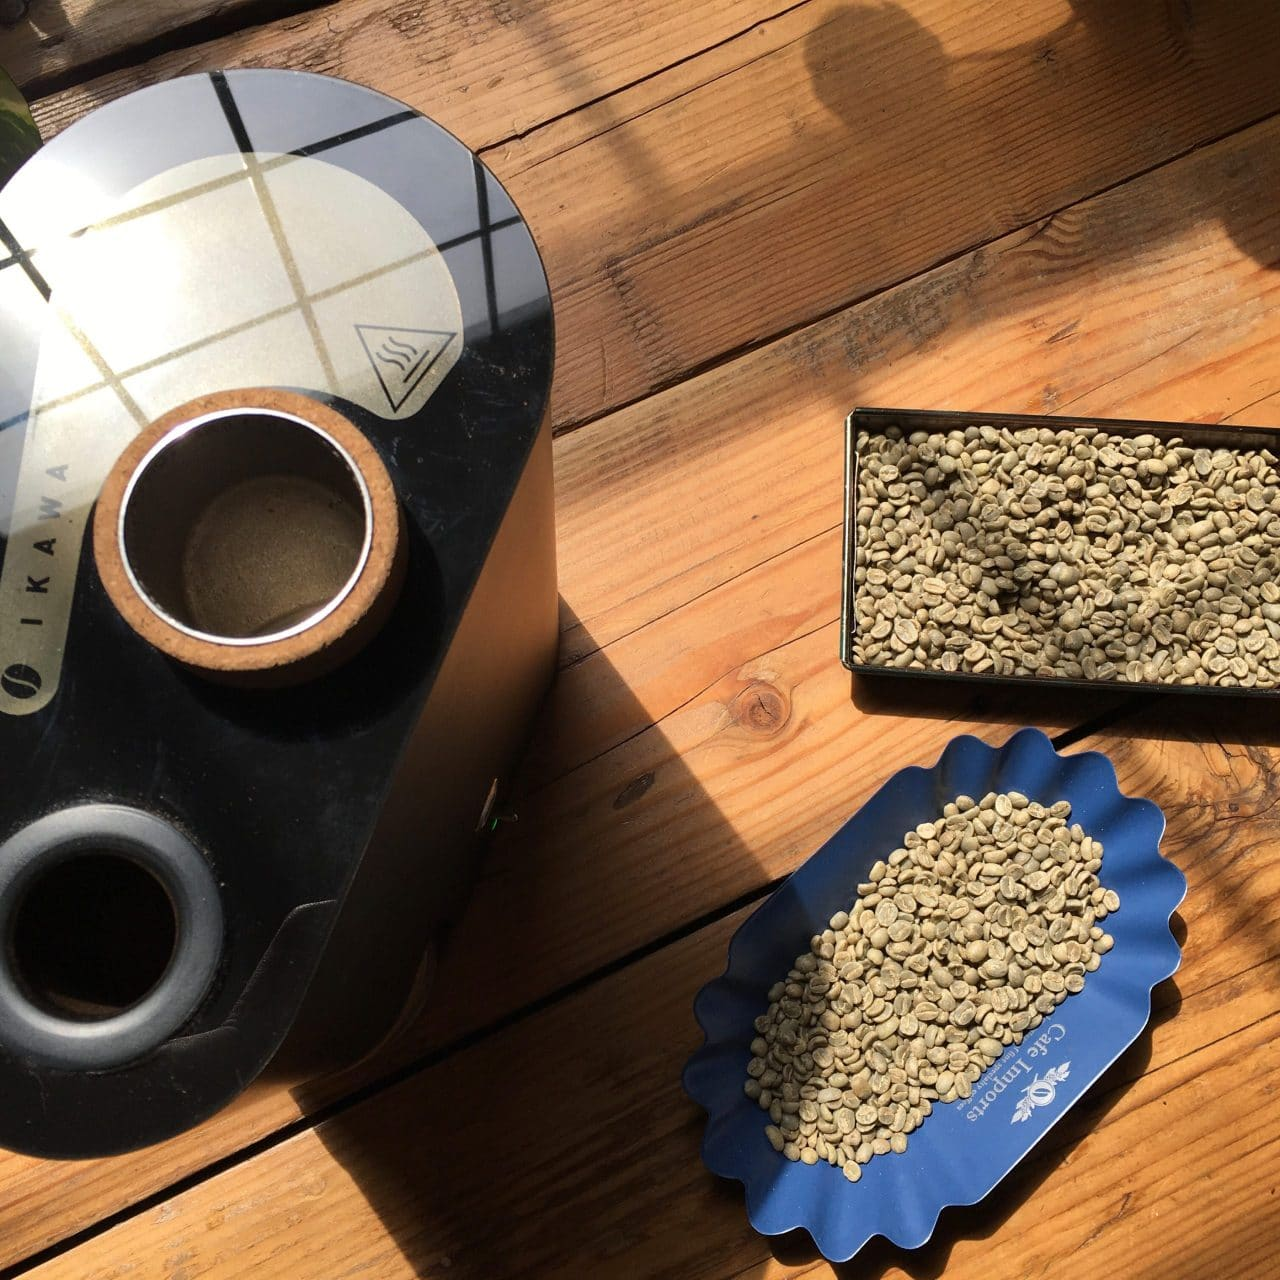 Ikawa roaster with green coffee beans